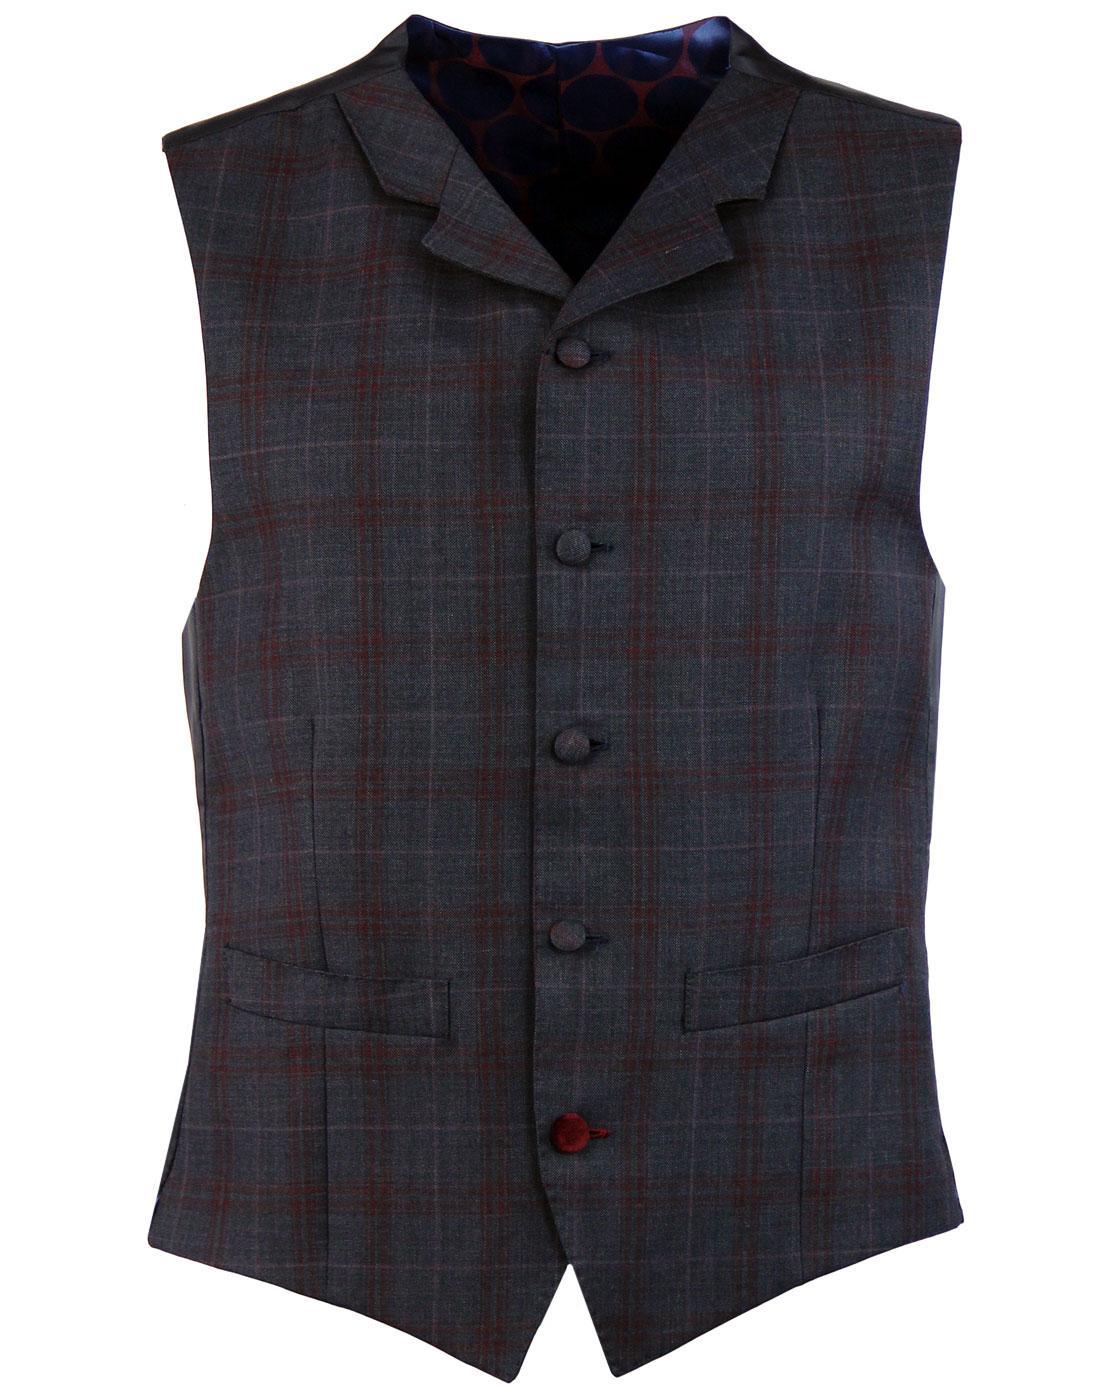 MADCAP ENGLAND 60s Mod Plaid Check Lapel Waistcoat